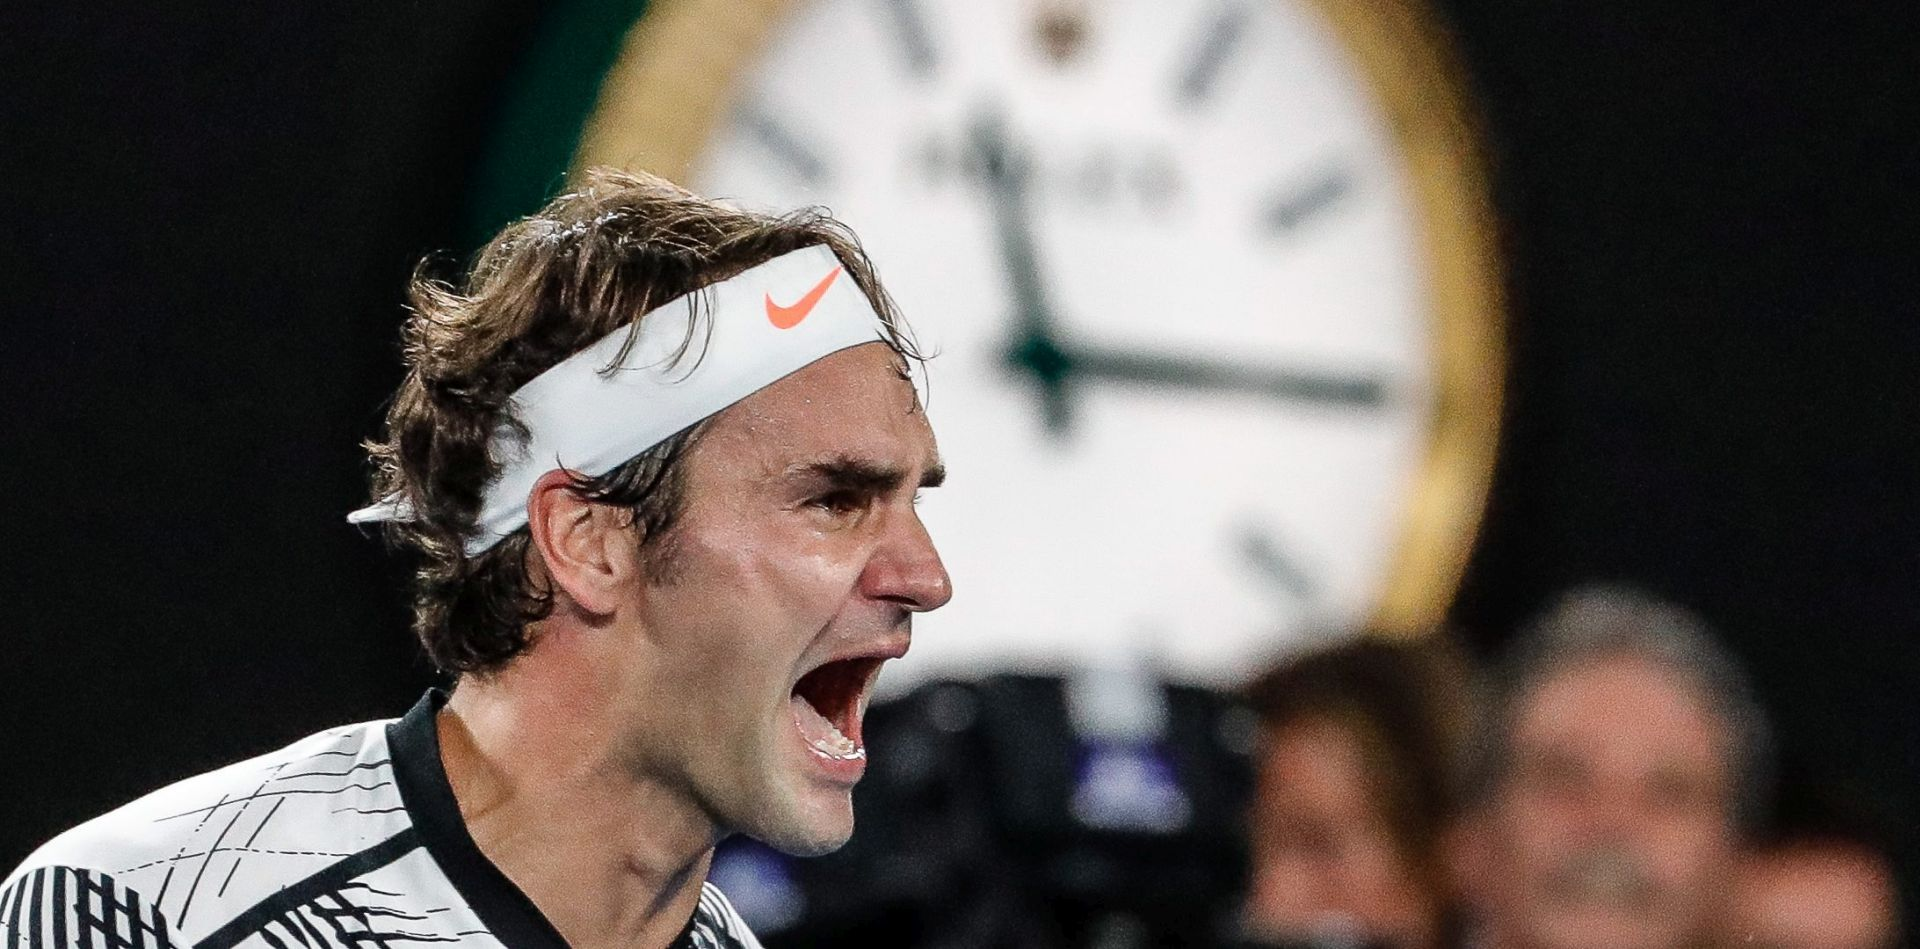 epa05758920 Roger Federer of Switzerland celebrates winning against Rafael Nadal of Spain during their Men's Singles final match at the Australian Open Grand Slam tennis tournament in Melbourne, Victoria, Australia, 29 January 2017. EPA/MADE NAGI